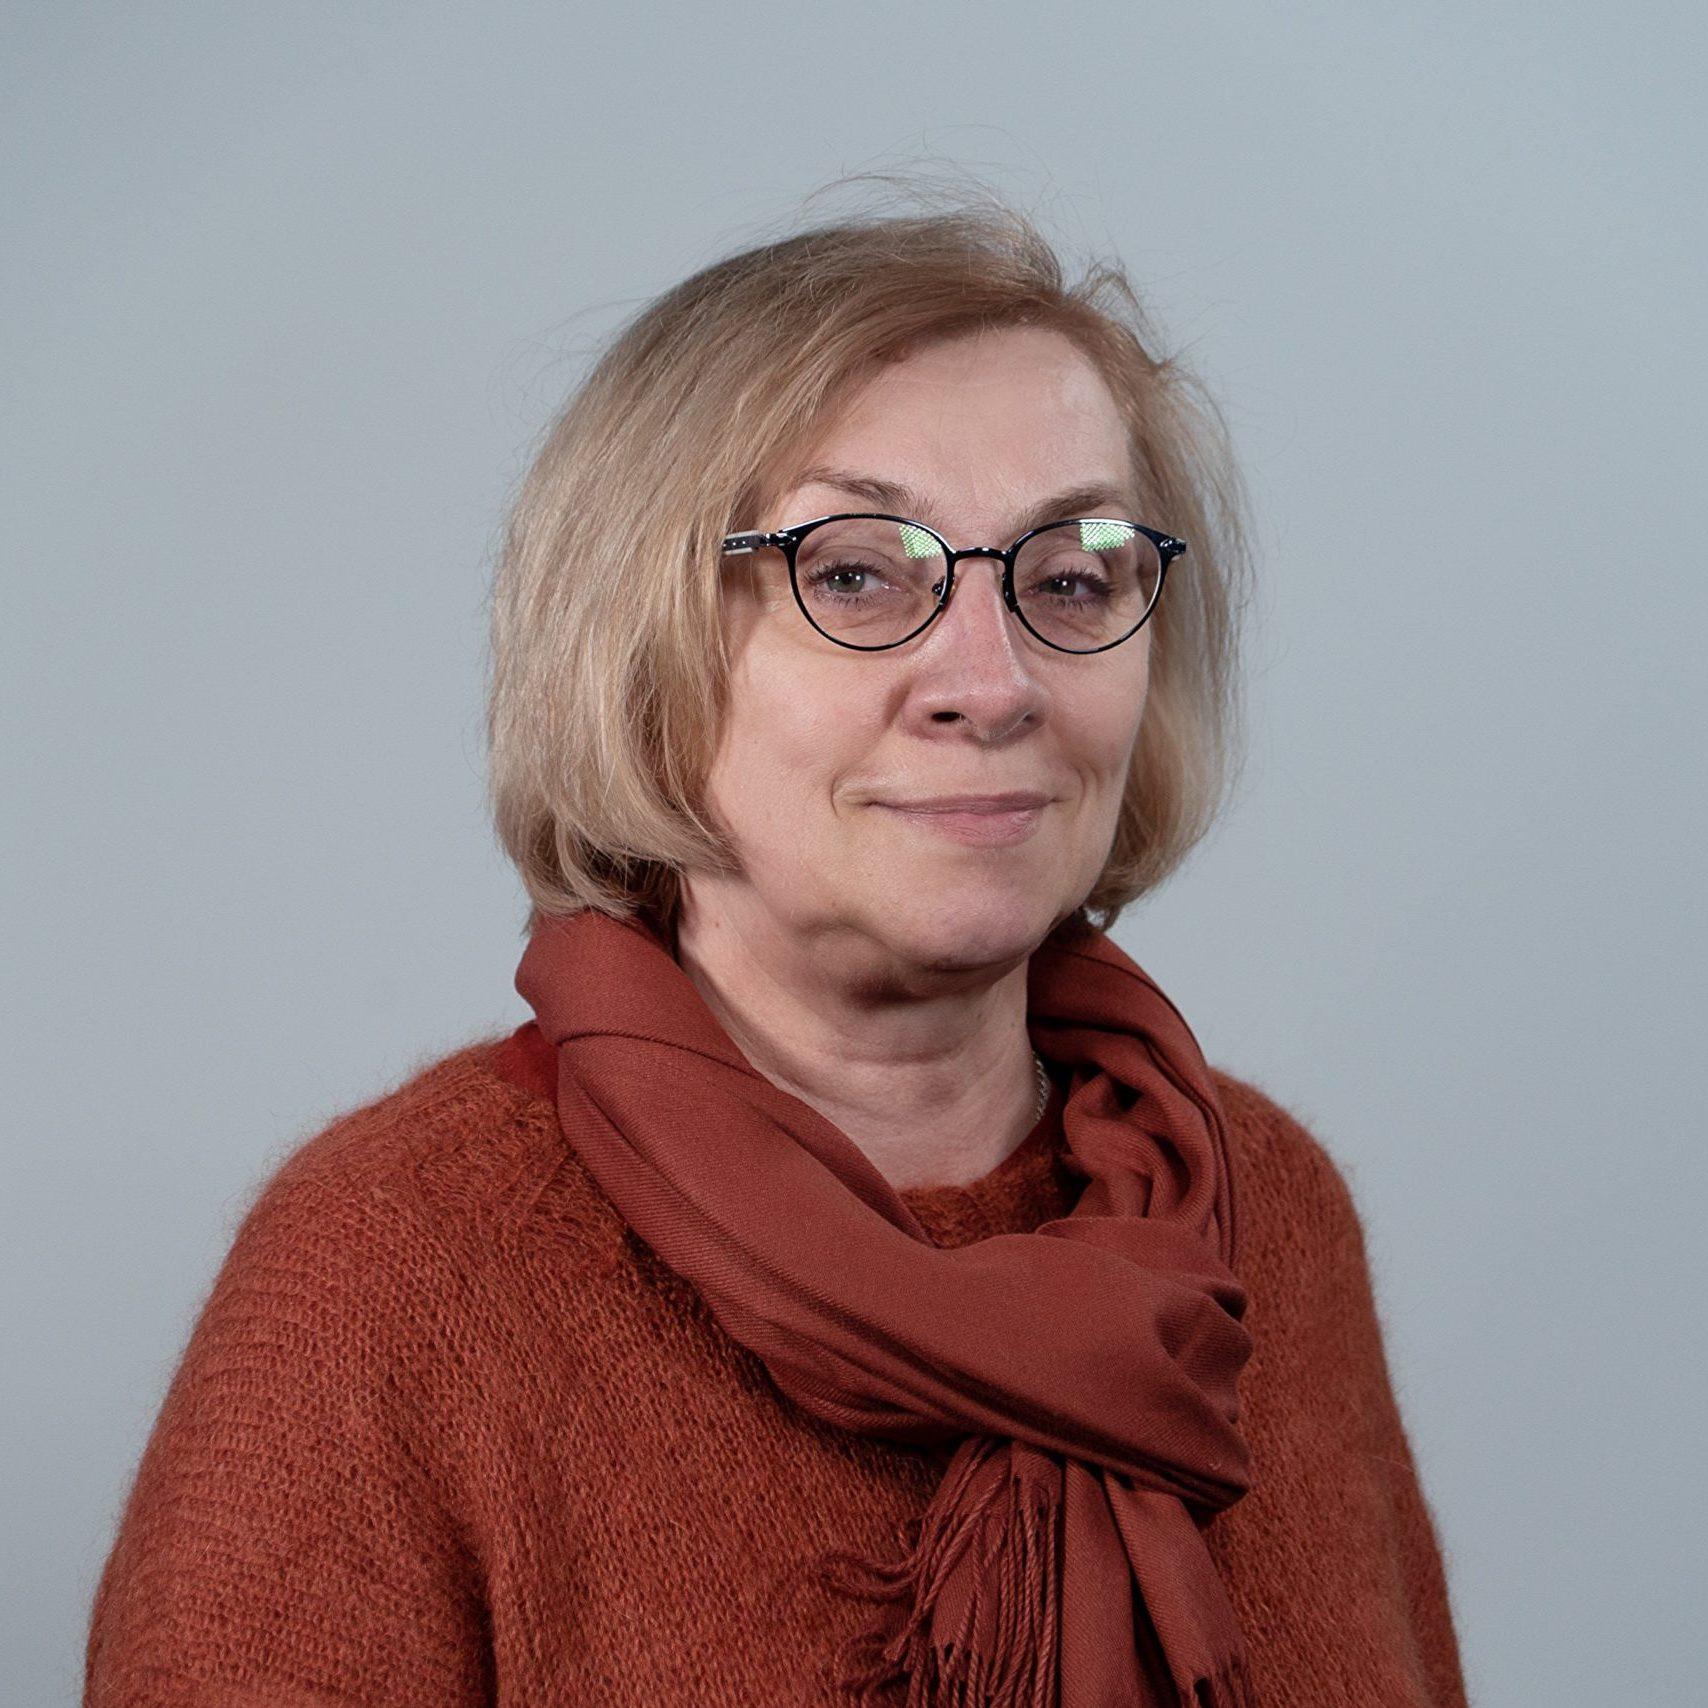 Жуланова Ирина Викторовна